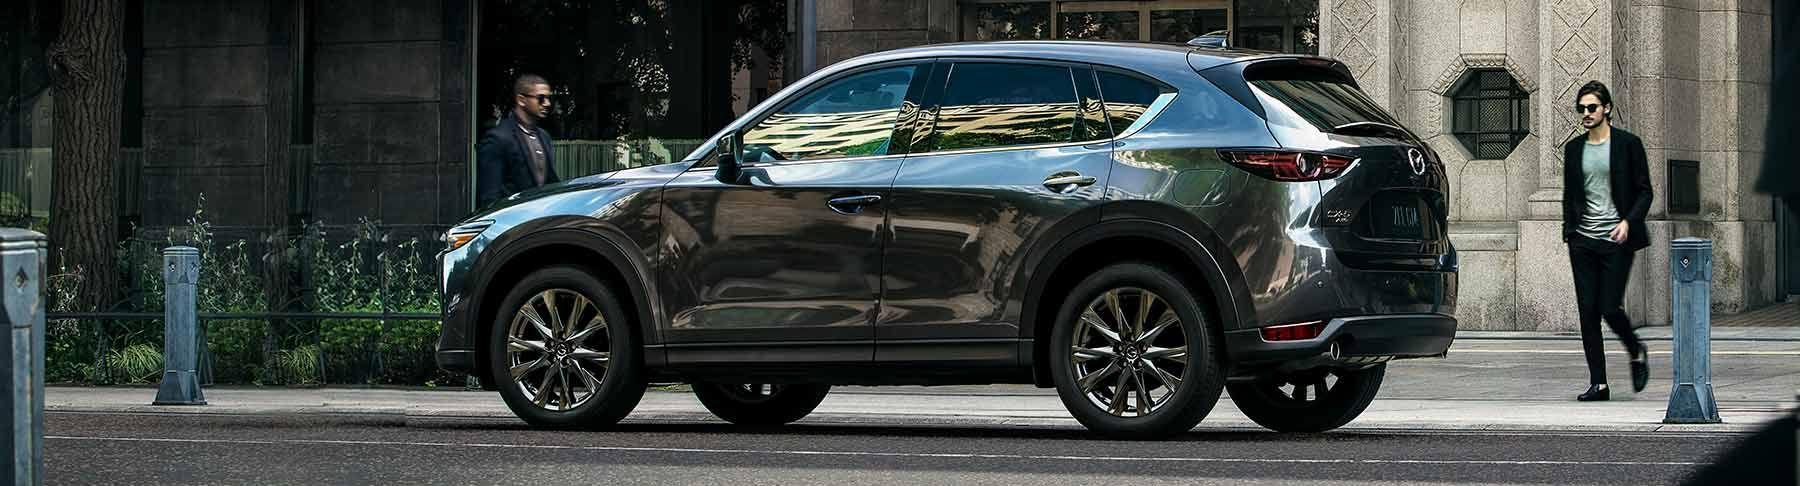 2019 Mazda CX-5 Financing near Temple, TX